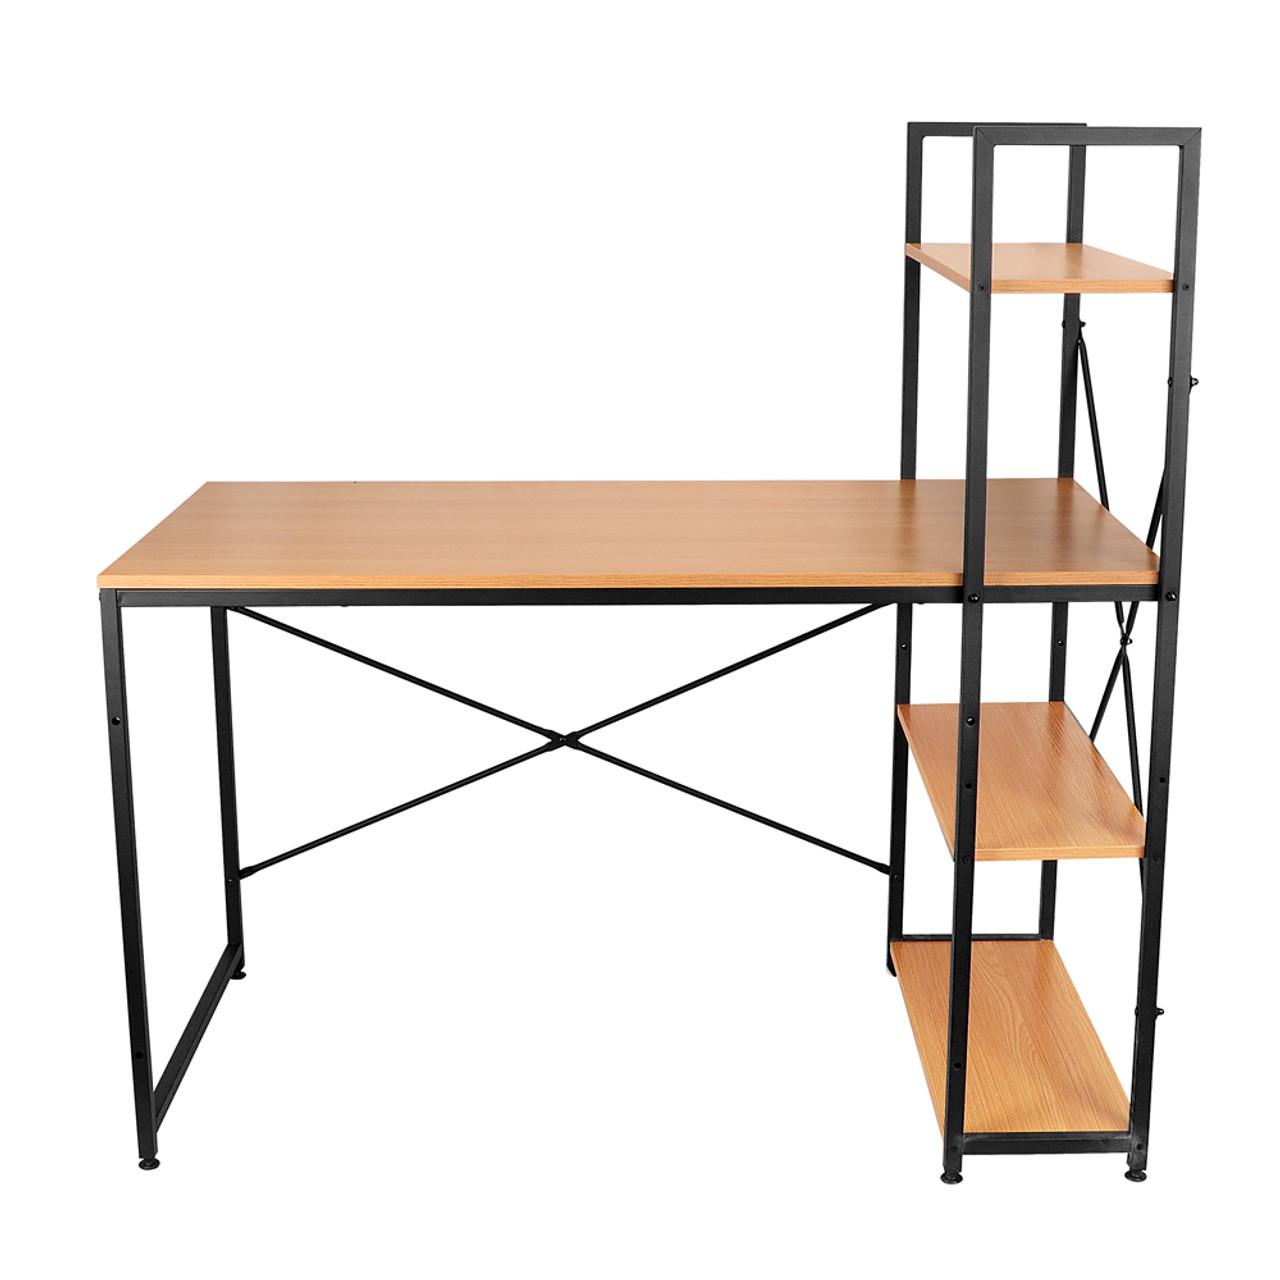 Wooden Computer Desk with Bookshelf